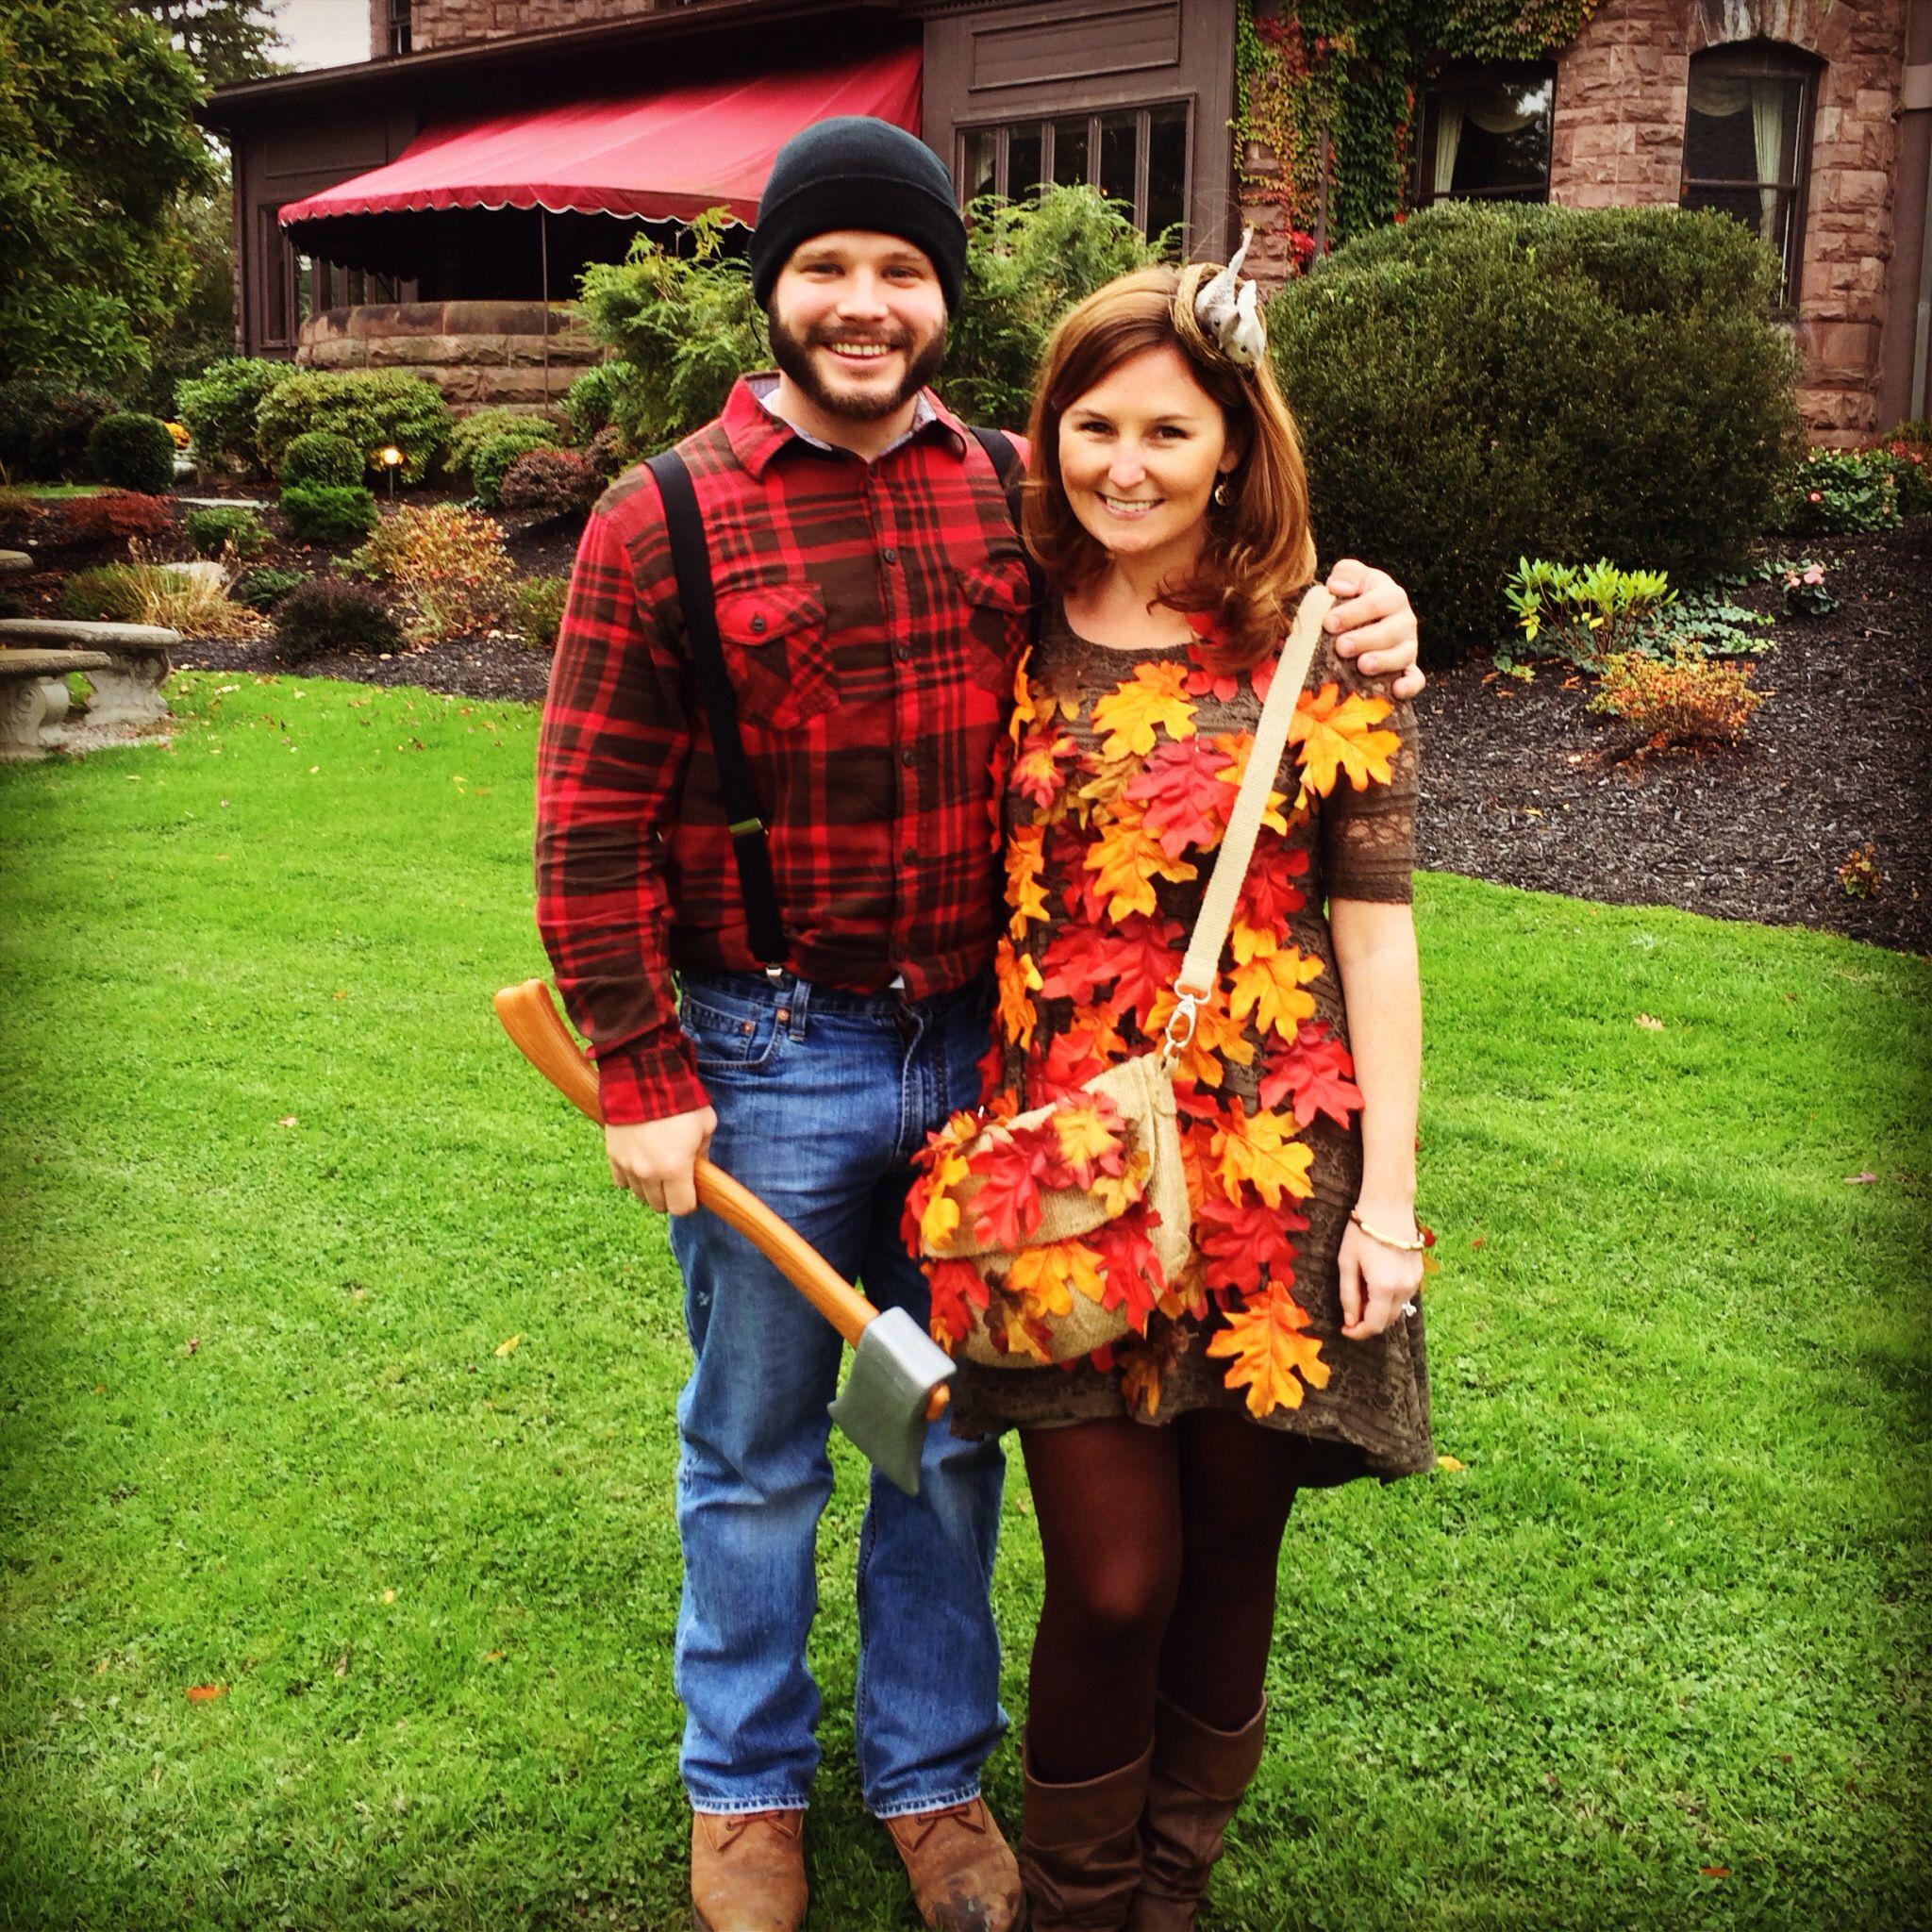 Lumberjack And Tree Halloween Costume